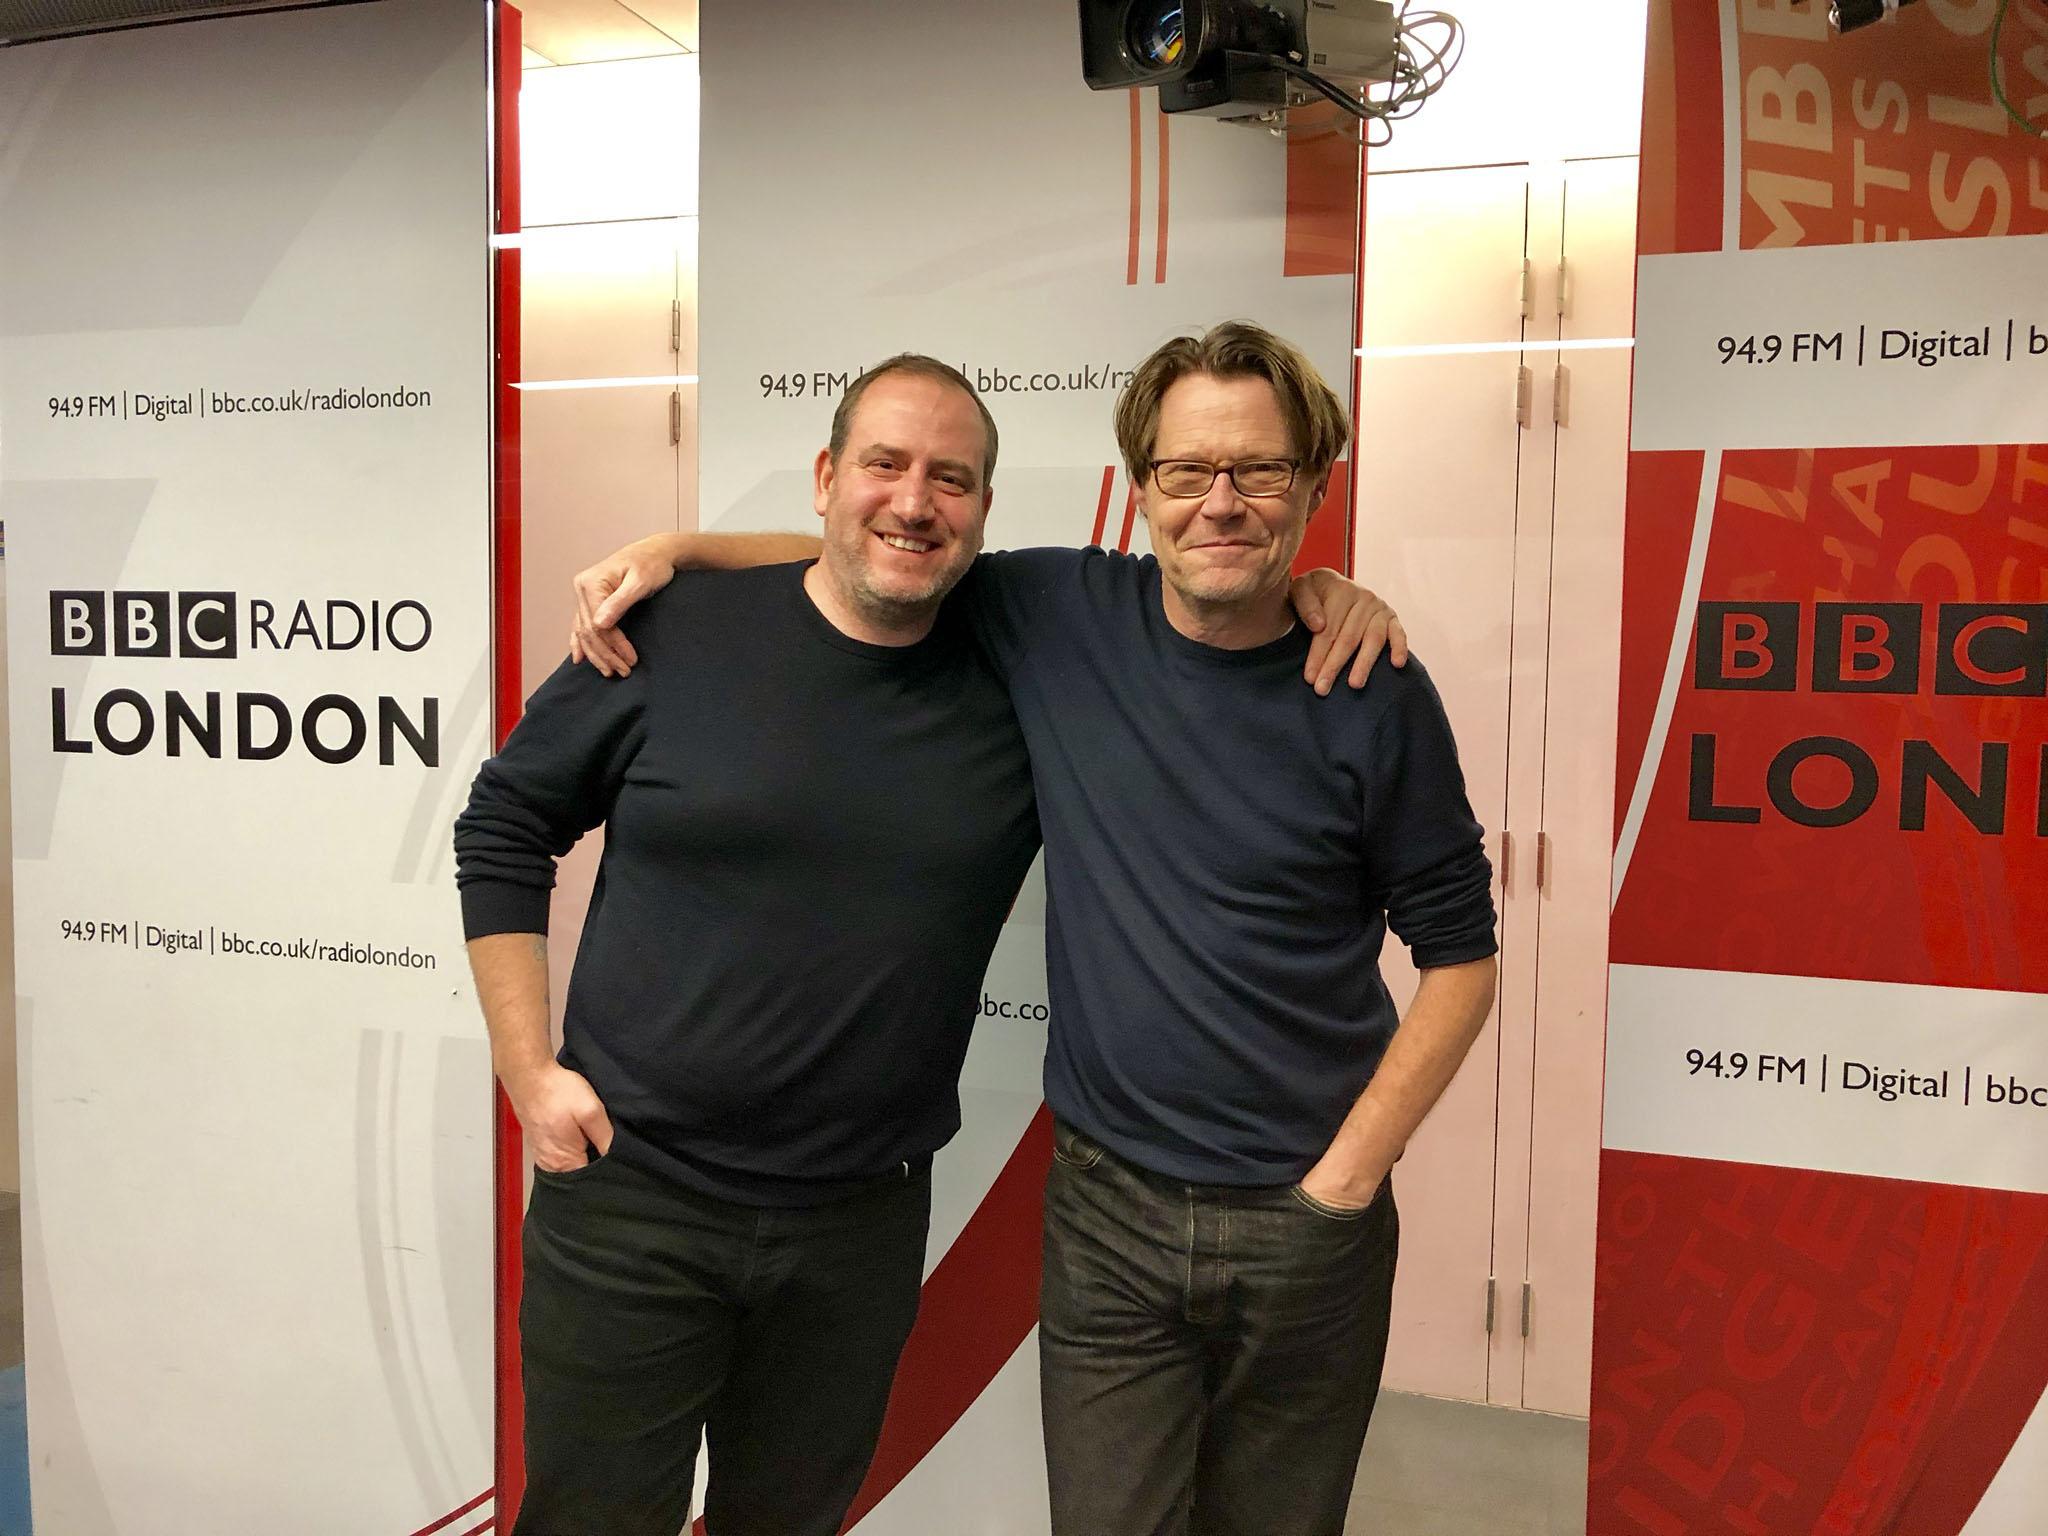 Simon Boyle on Robert Elms BBC Radio London show